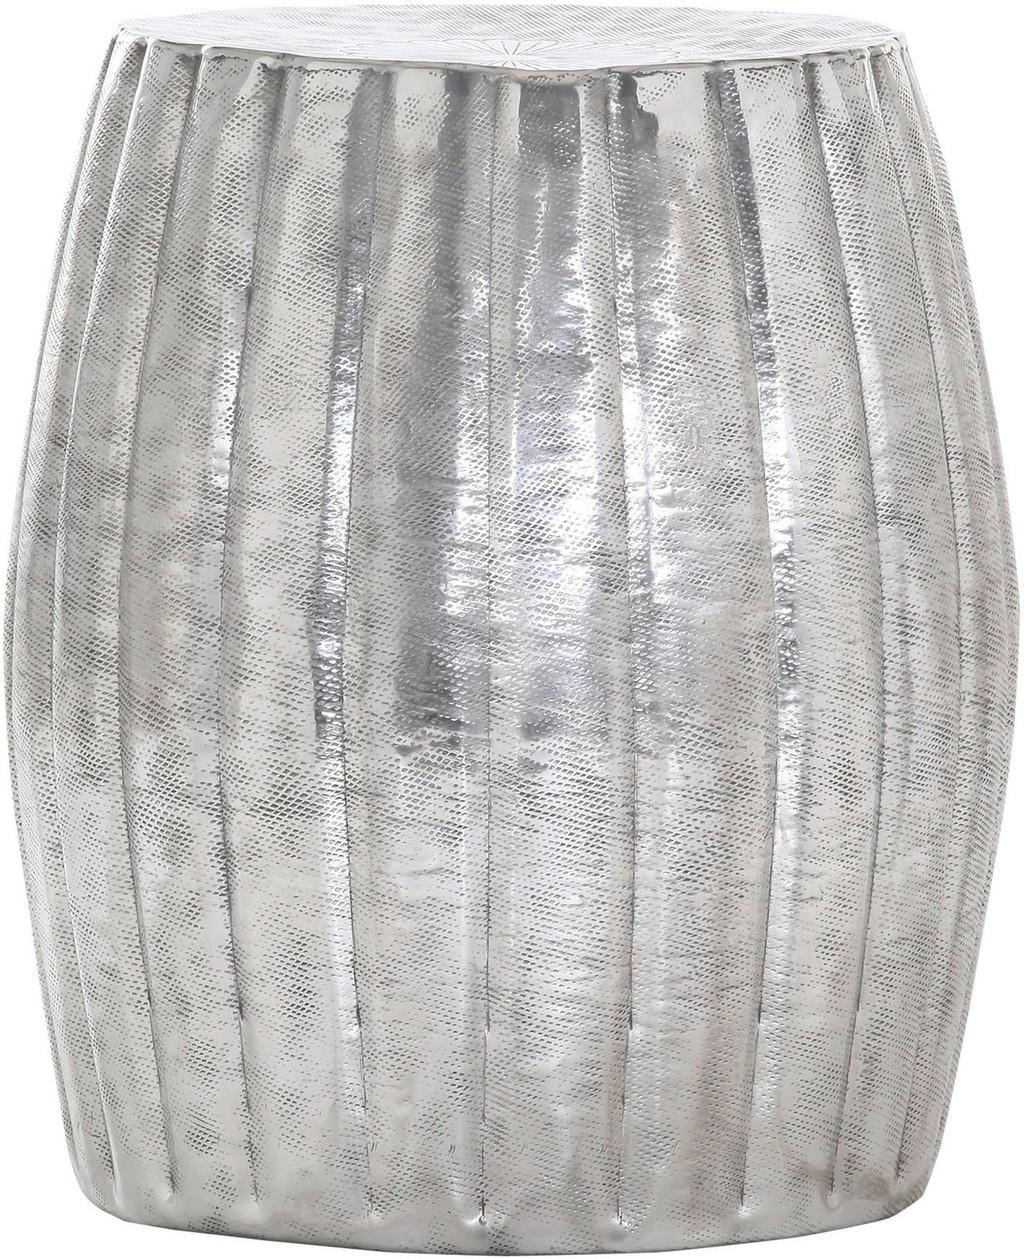 CARRYHOME HOCKER Silber